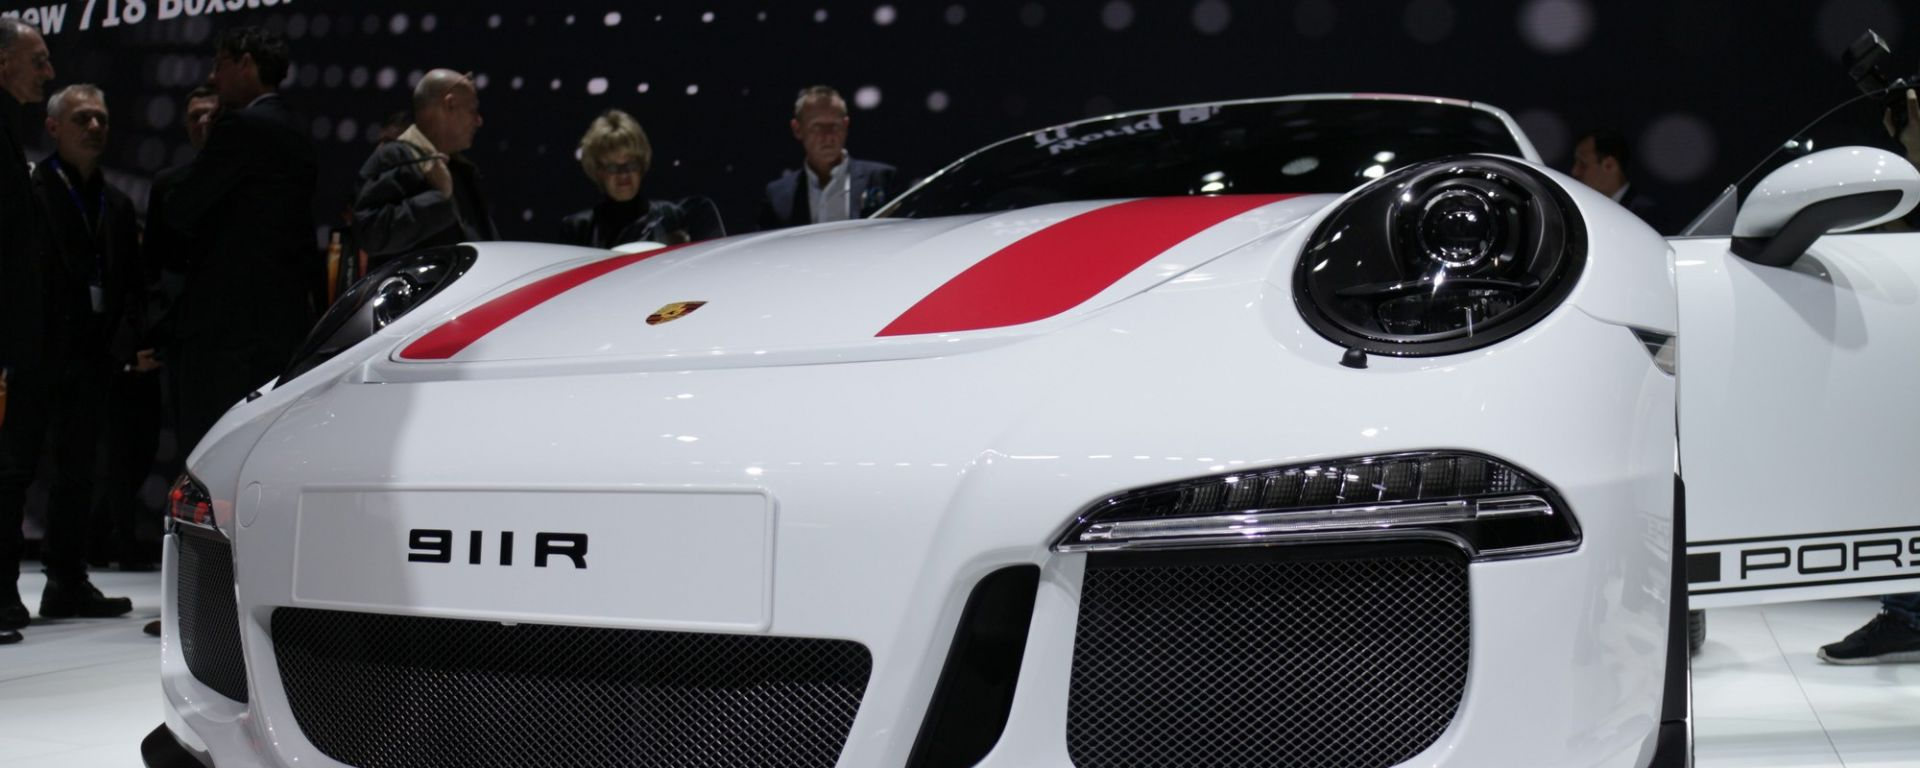 Ginevra 2016: le novità Porsche